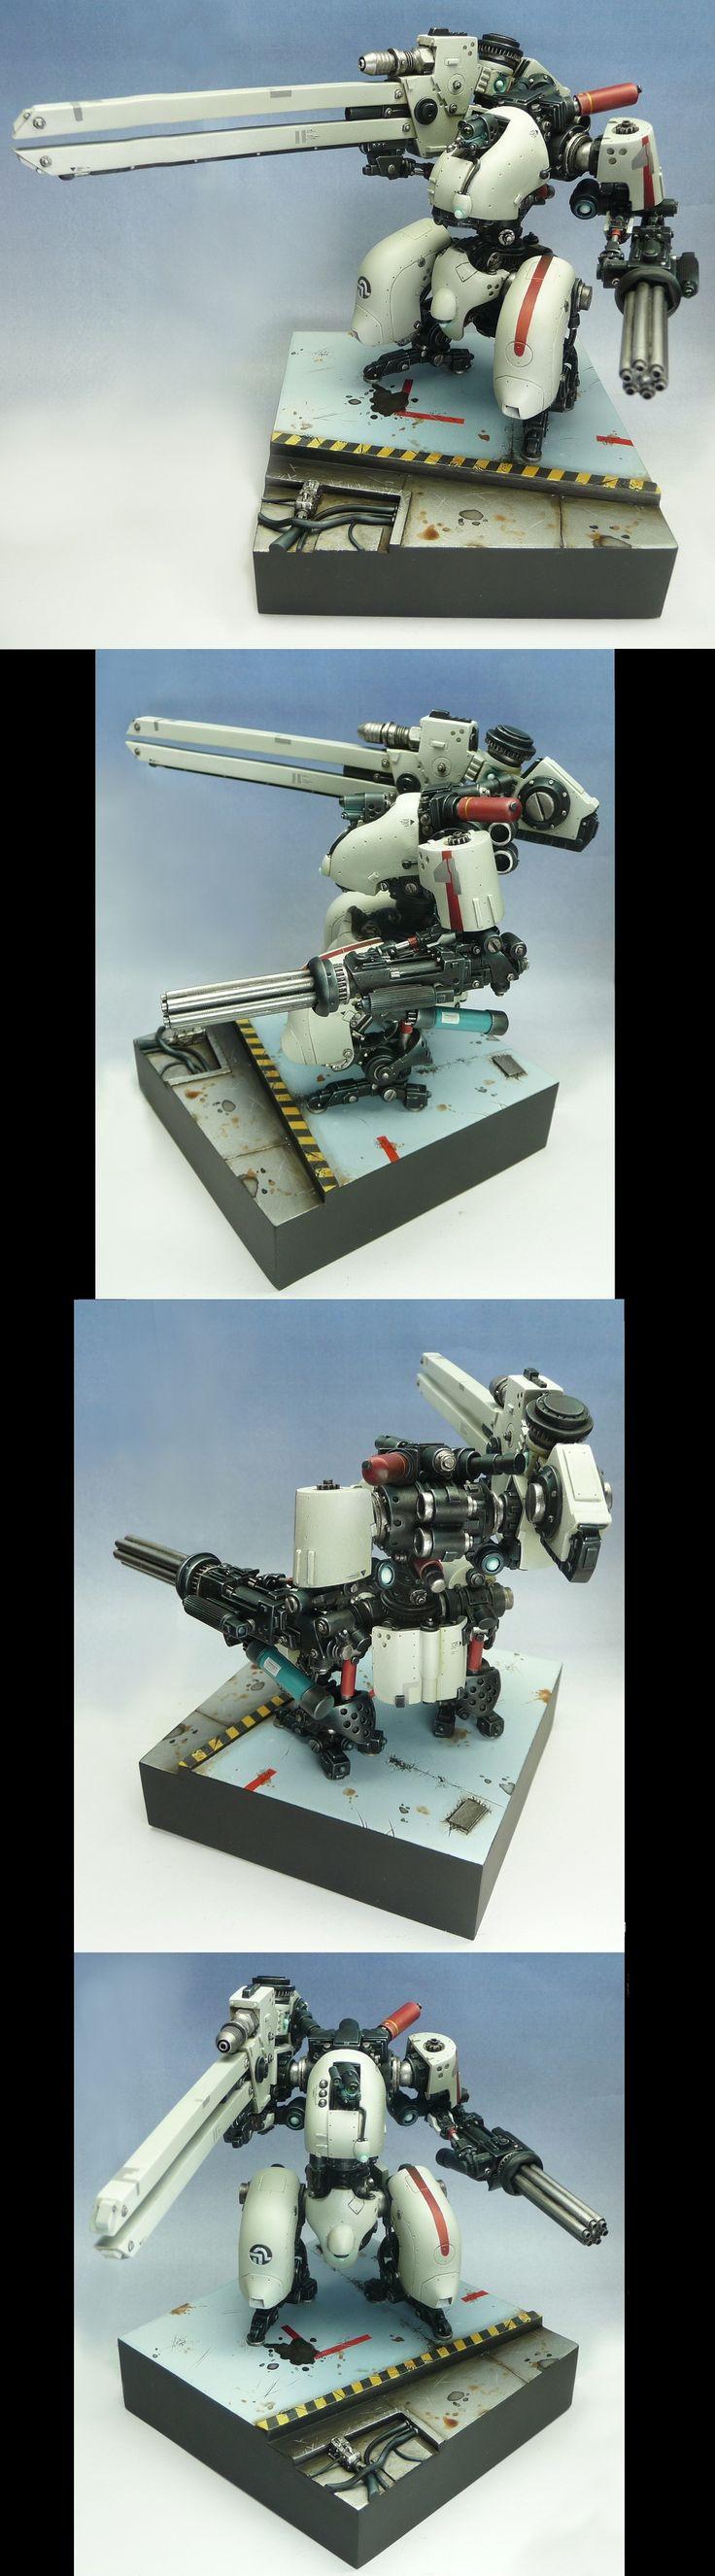 Filbot FDV4 Mako with Railgun - Love the basing.